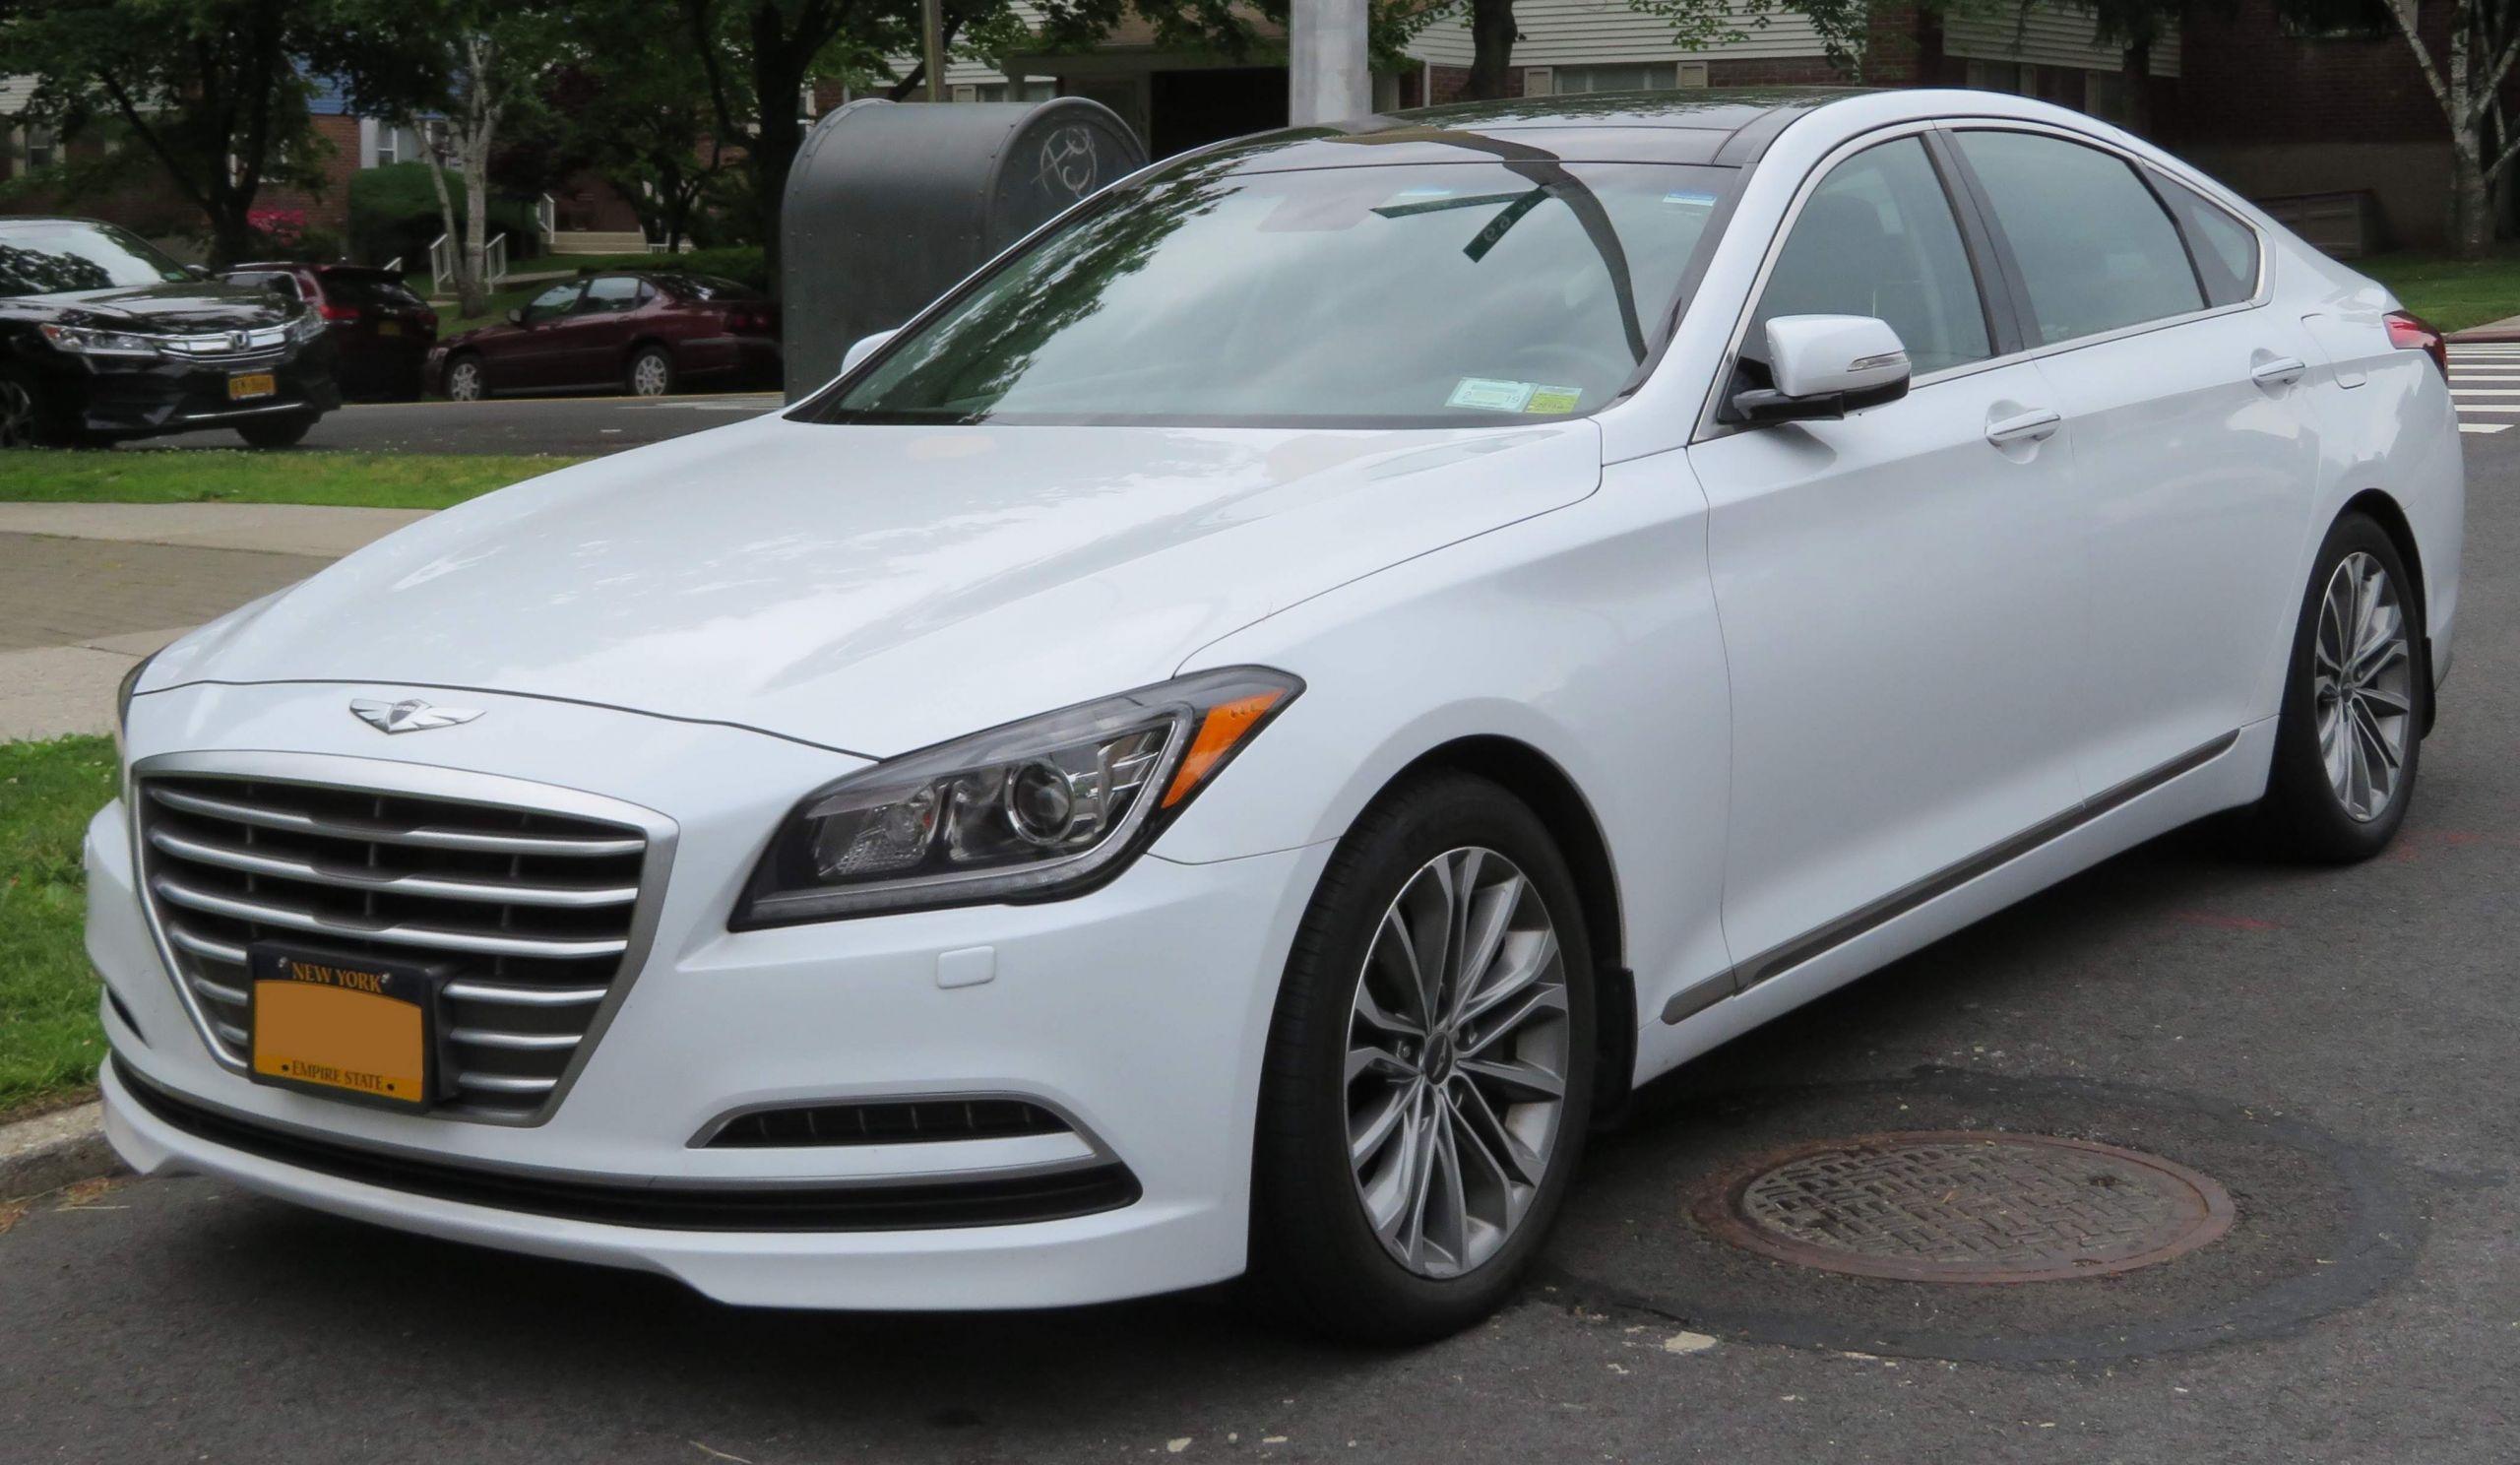 2020 Hyundai Genesis Coupe V8 Price and Review